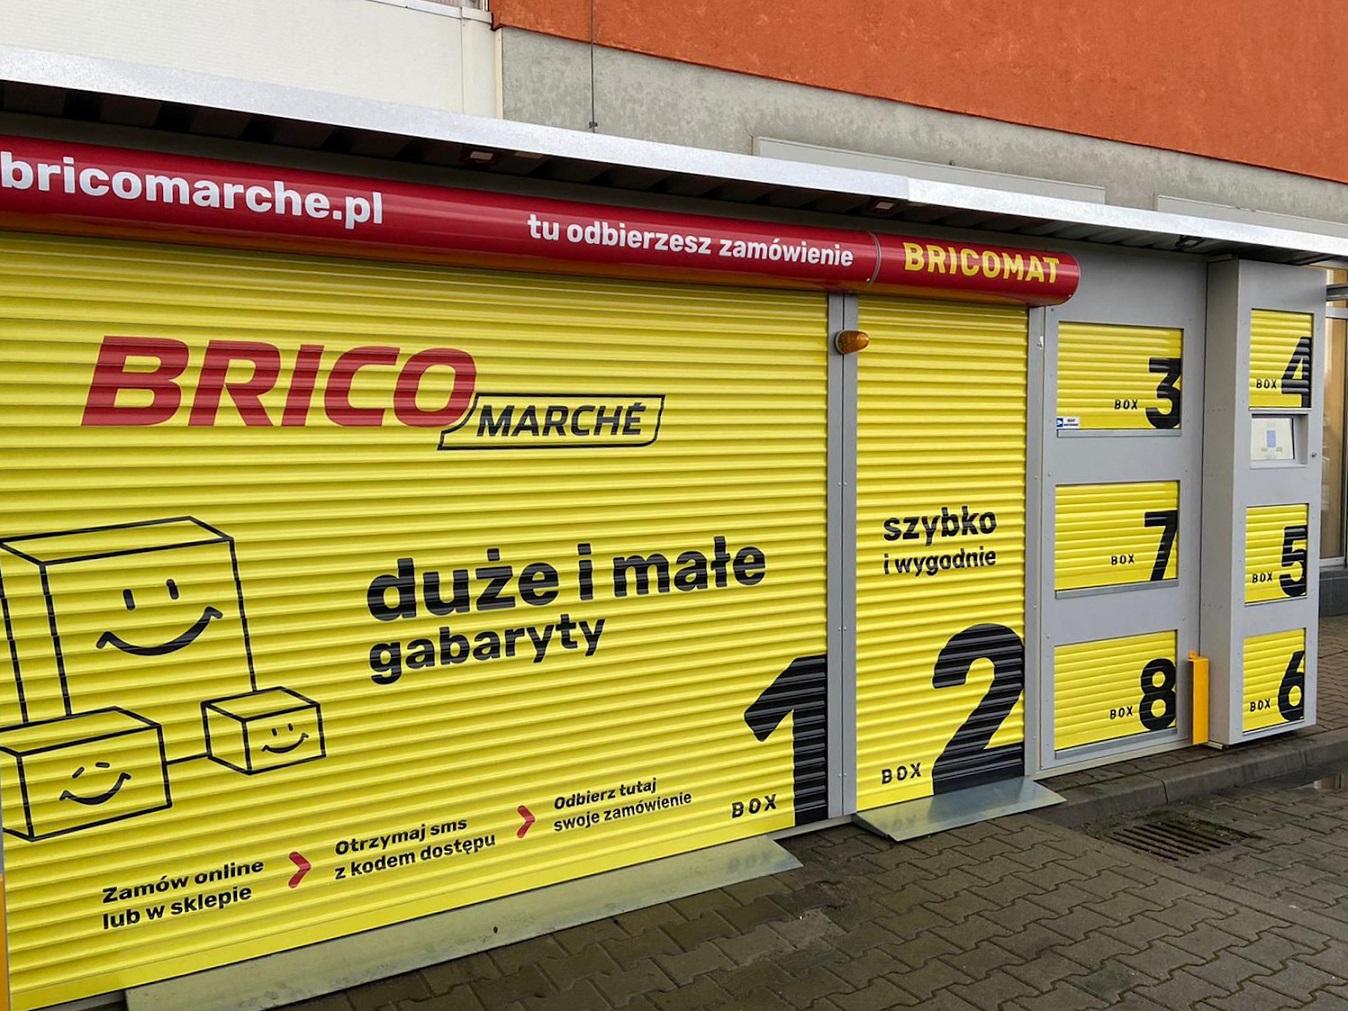 Bricomarché_retail_journal_edited